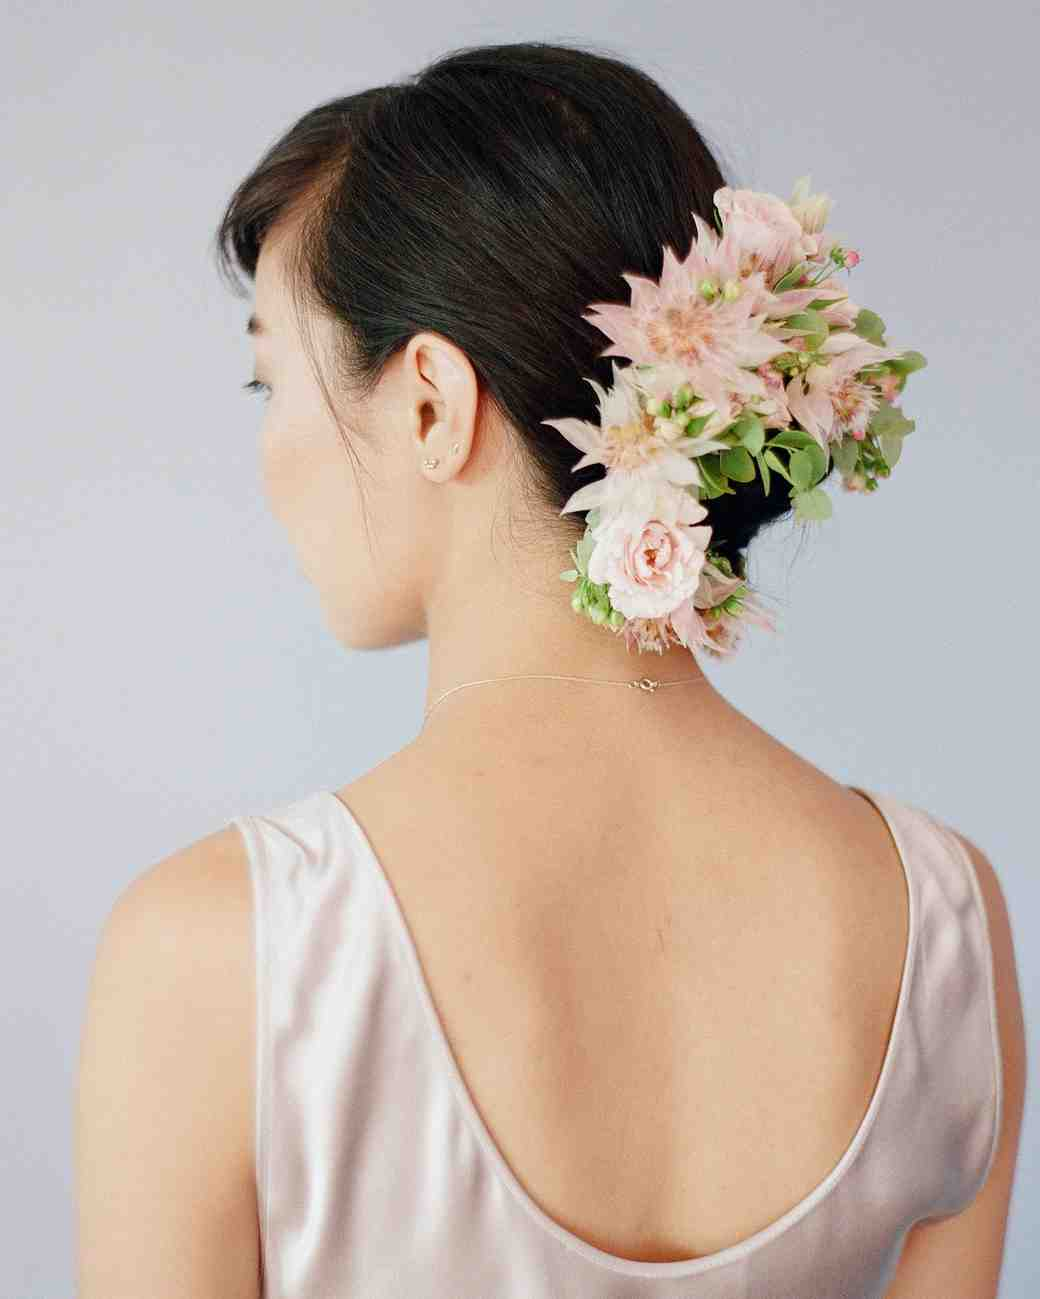 glara matthew wedding flowers